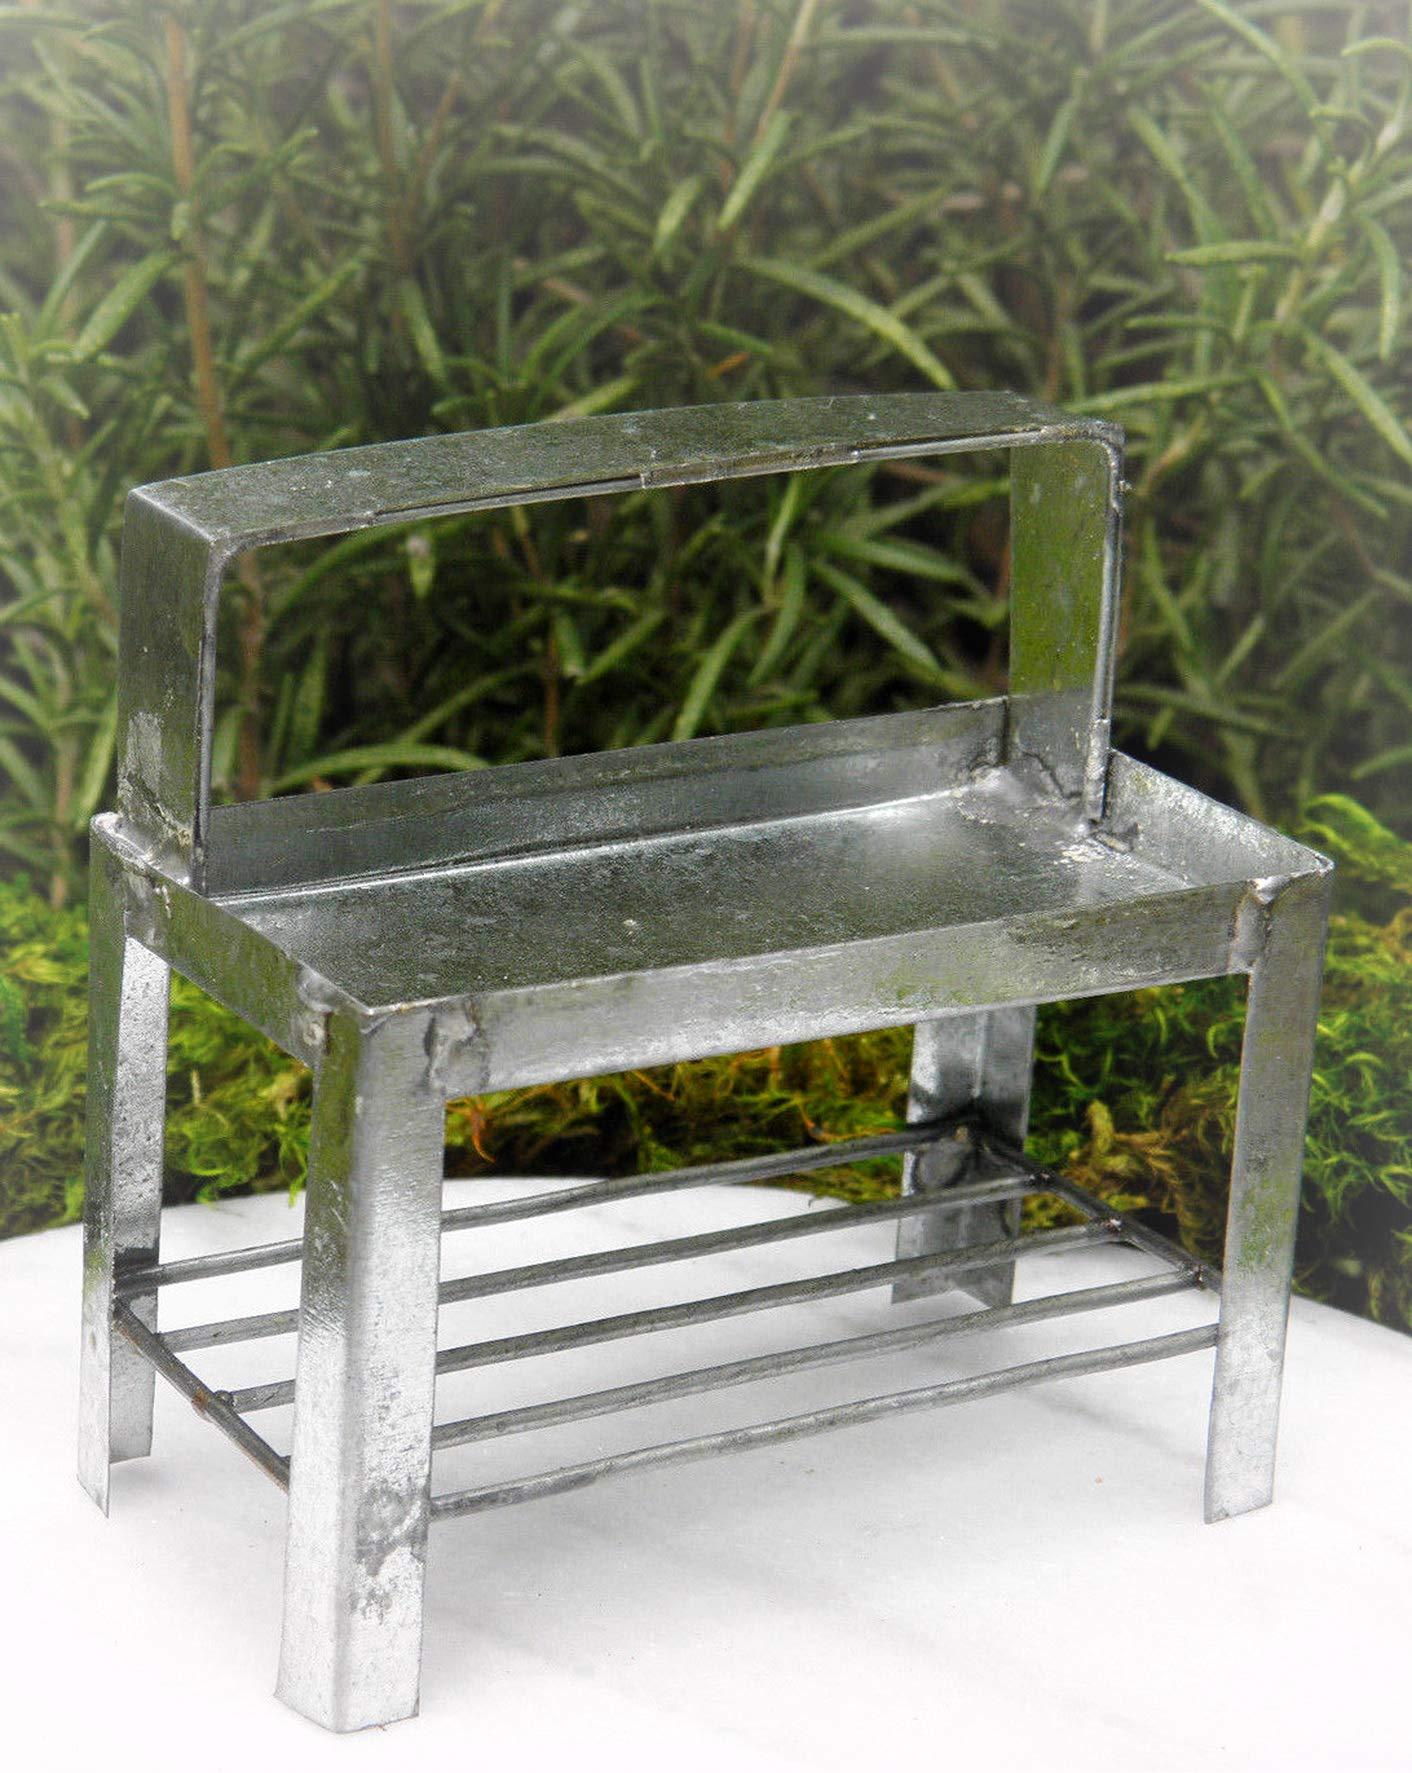 Dollhouse Furniture Tin Potting Bench Table Miniature Magic Scene Supplies Your Fairy Garden - Outdoor House Decor